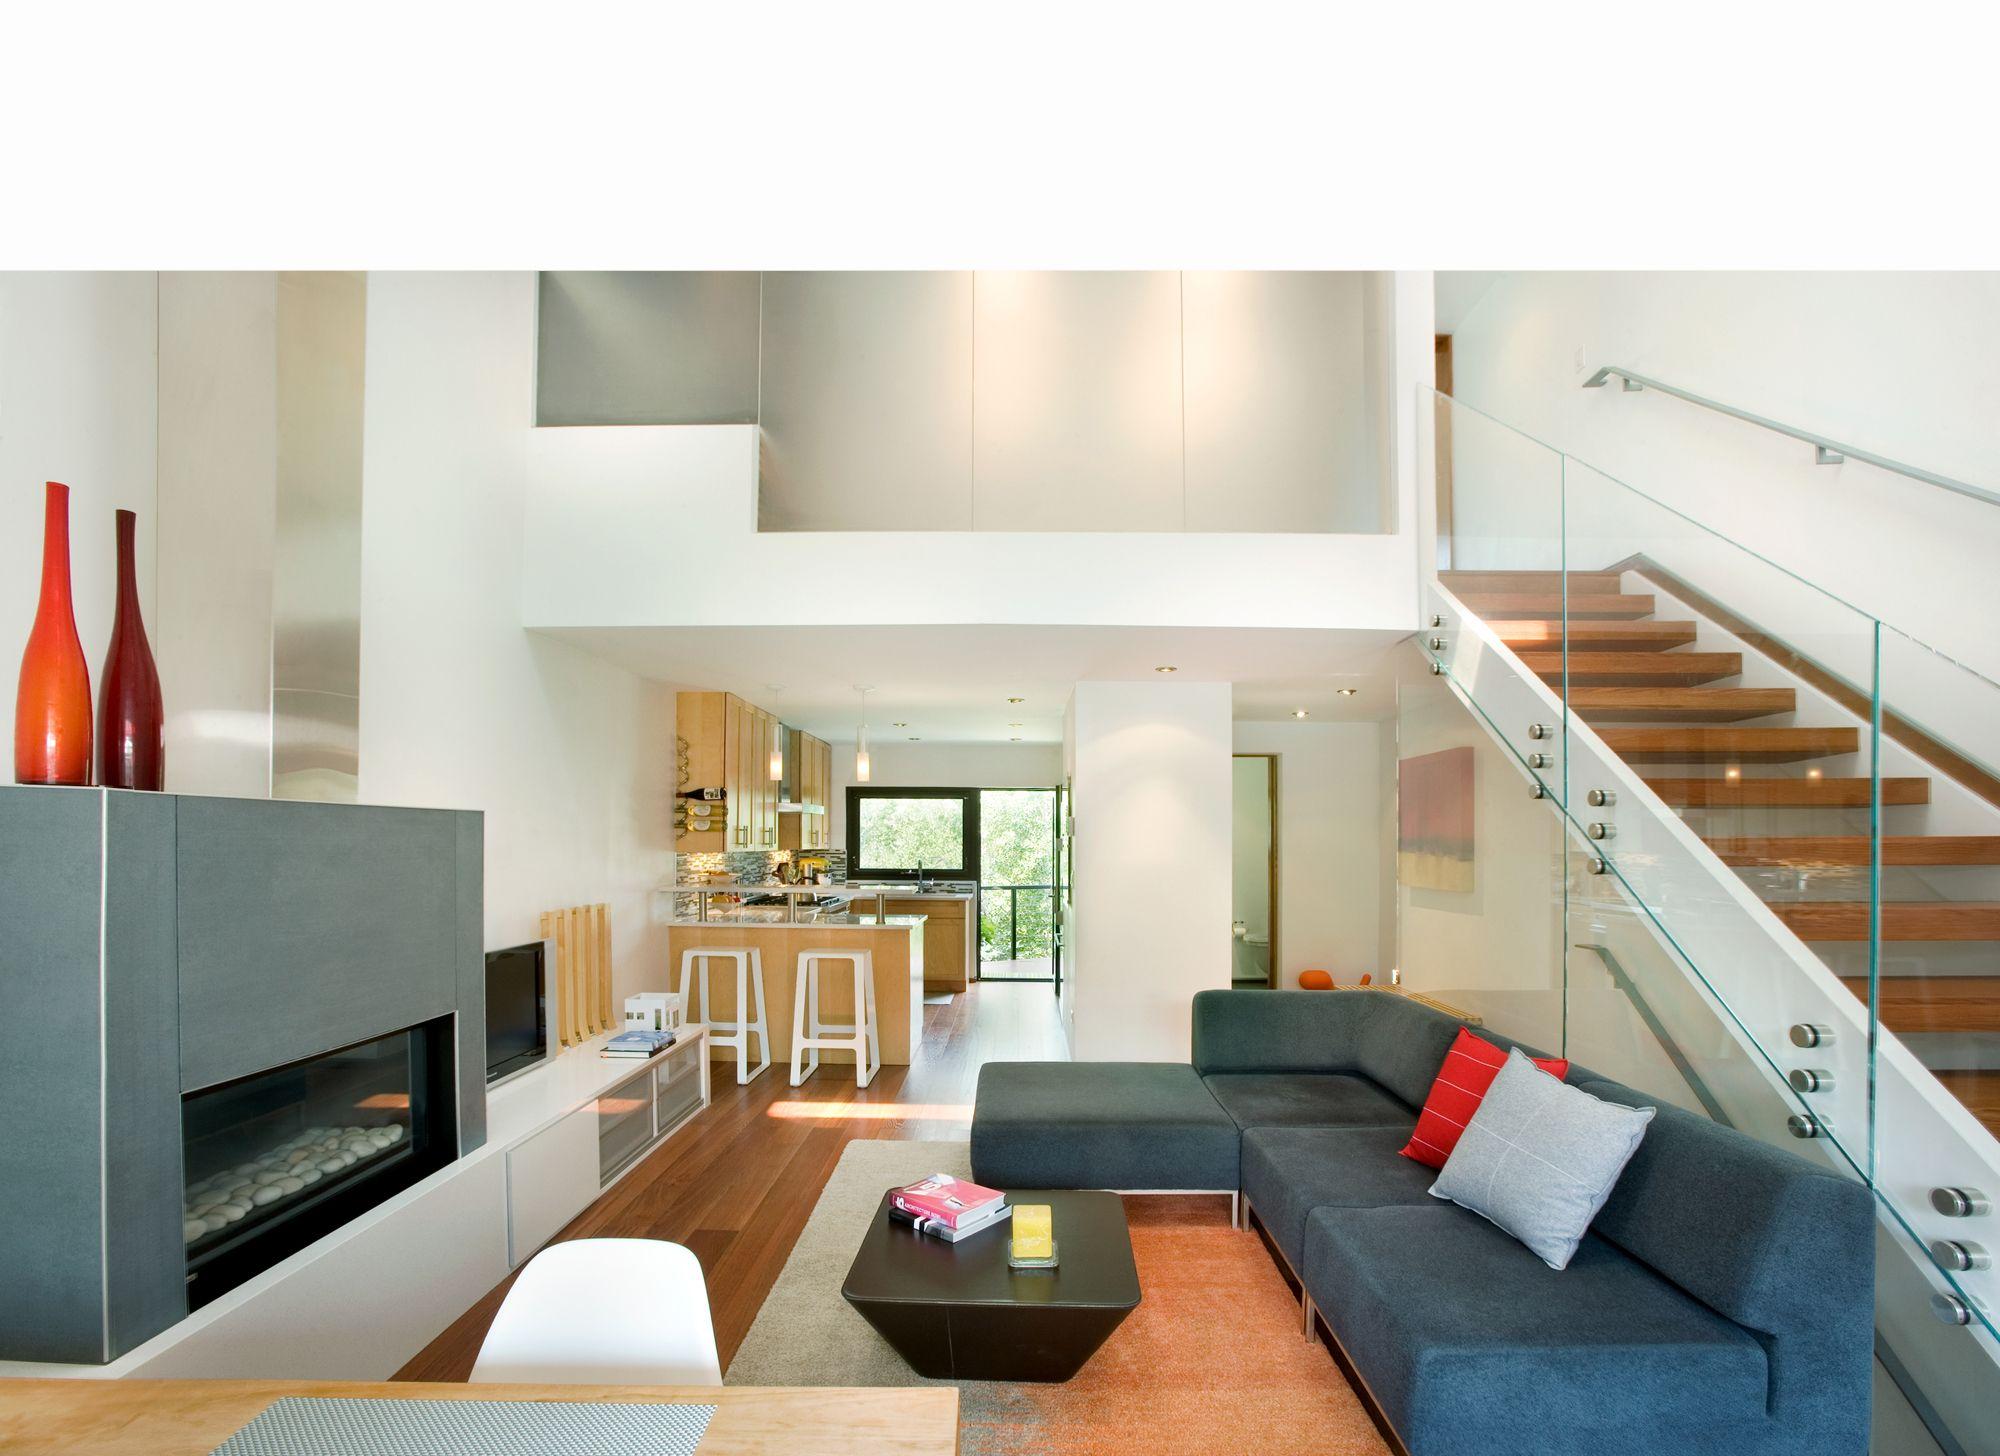 ROWHOUSE | ARCHITECTURAL | Pinterest | Aspen colorado, Modern ...